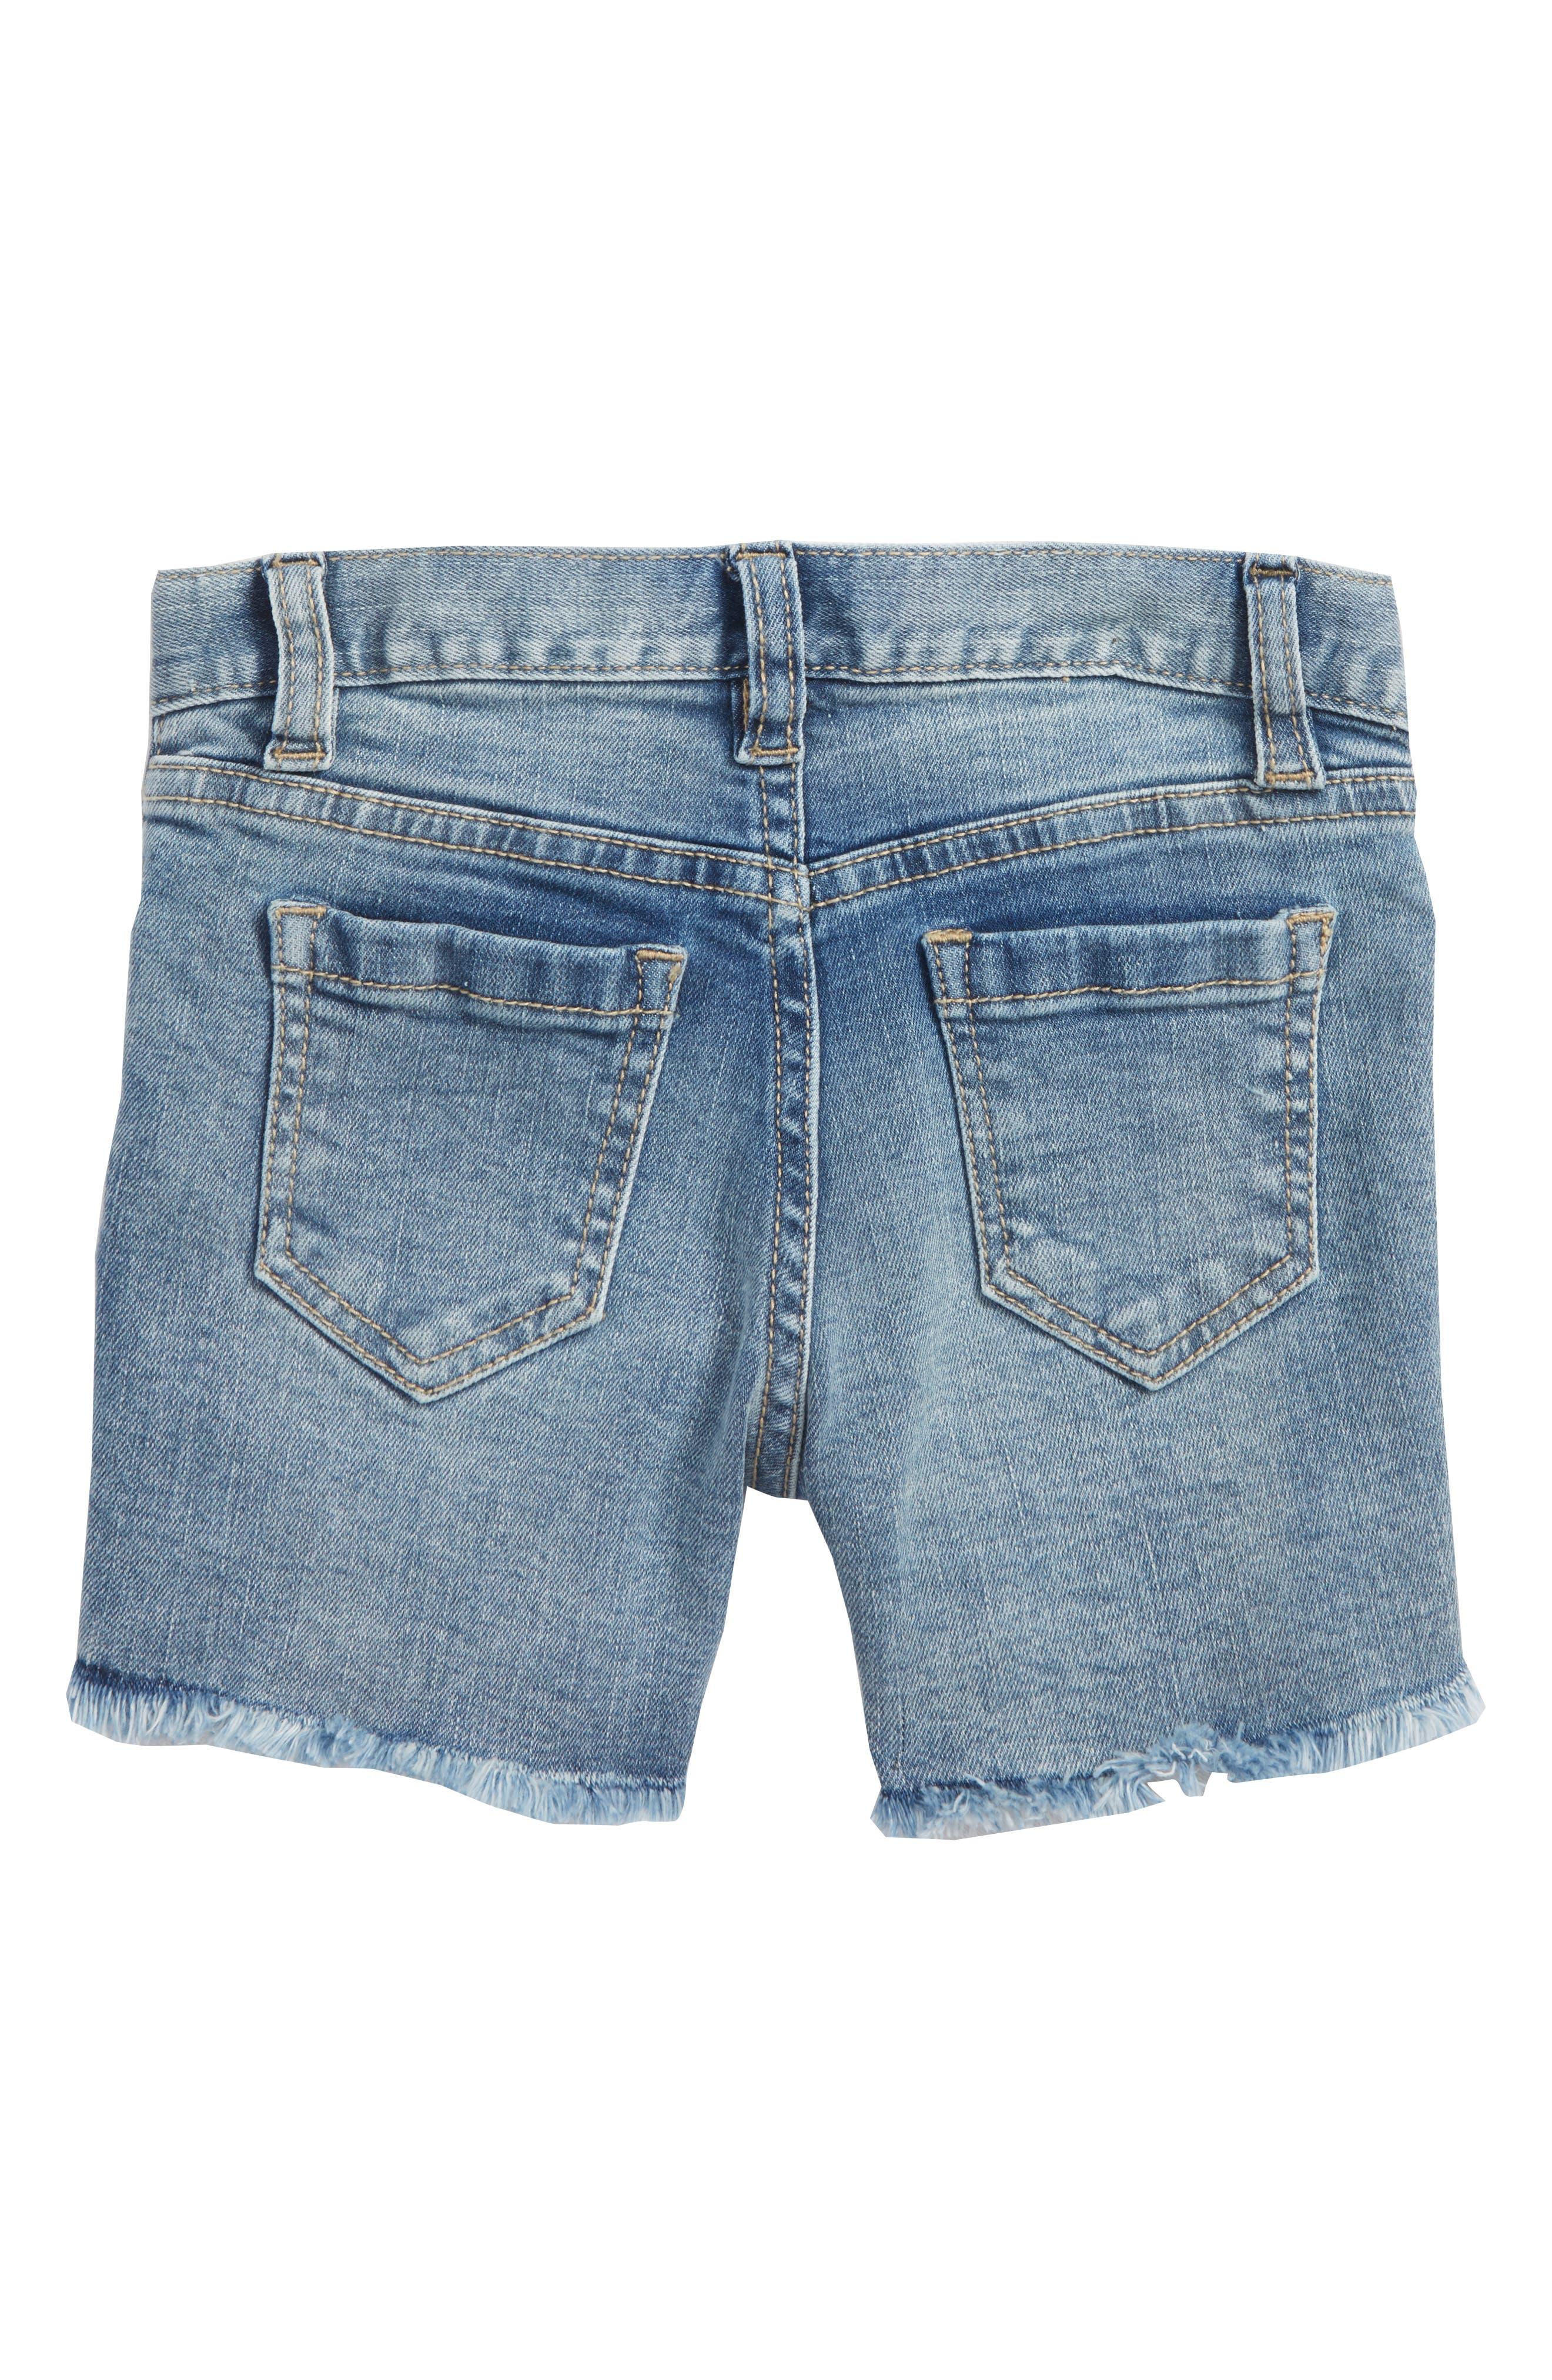 Embroidered Frayed Hem Denim Shorts,                             Alternate thumbnail 2, color,                             Medium Authentic